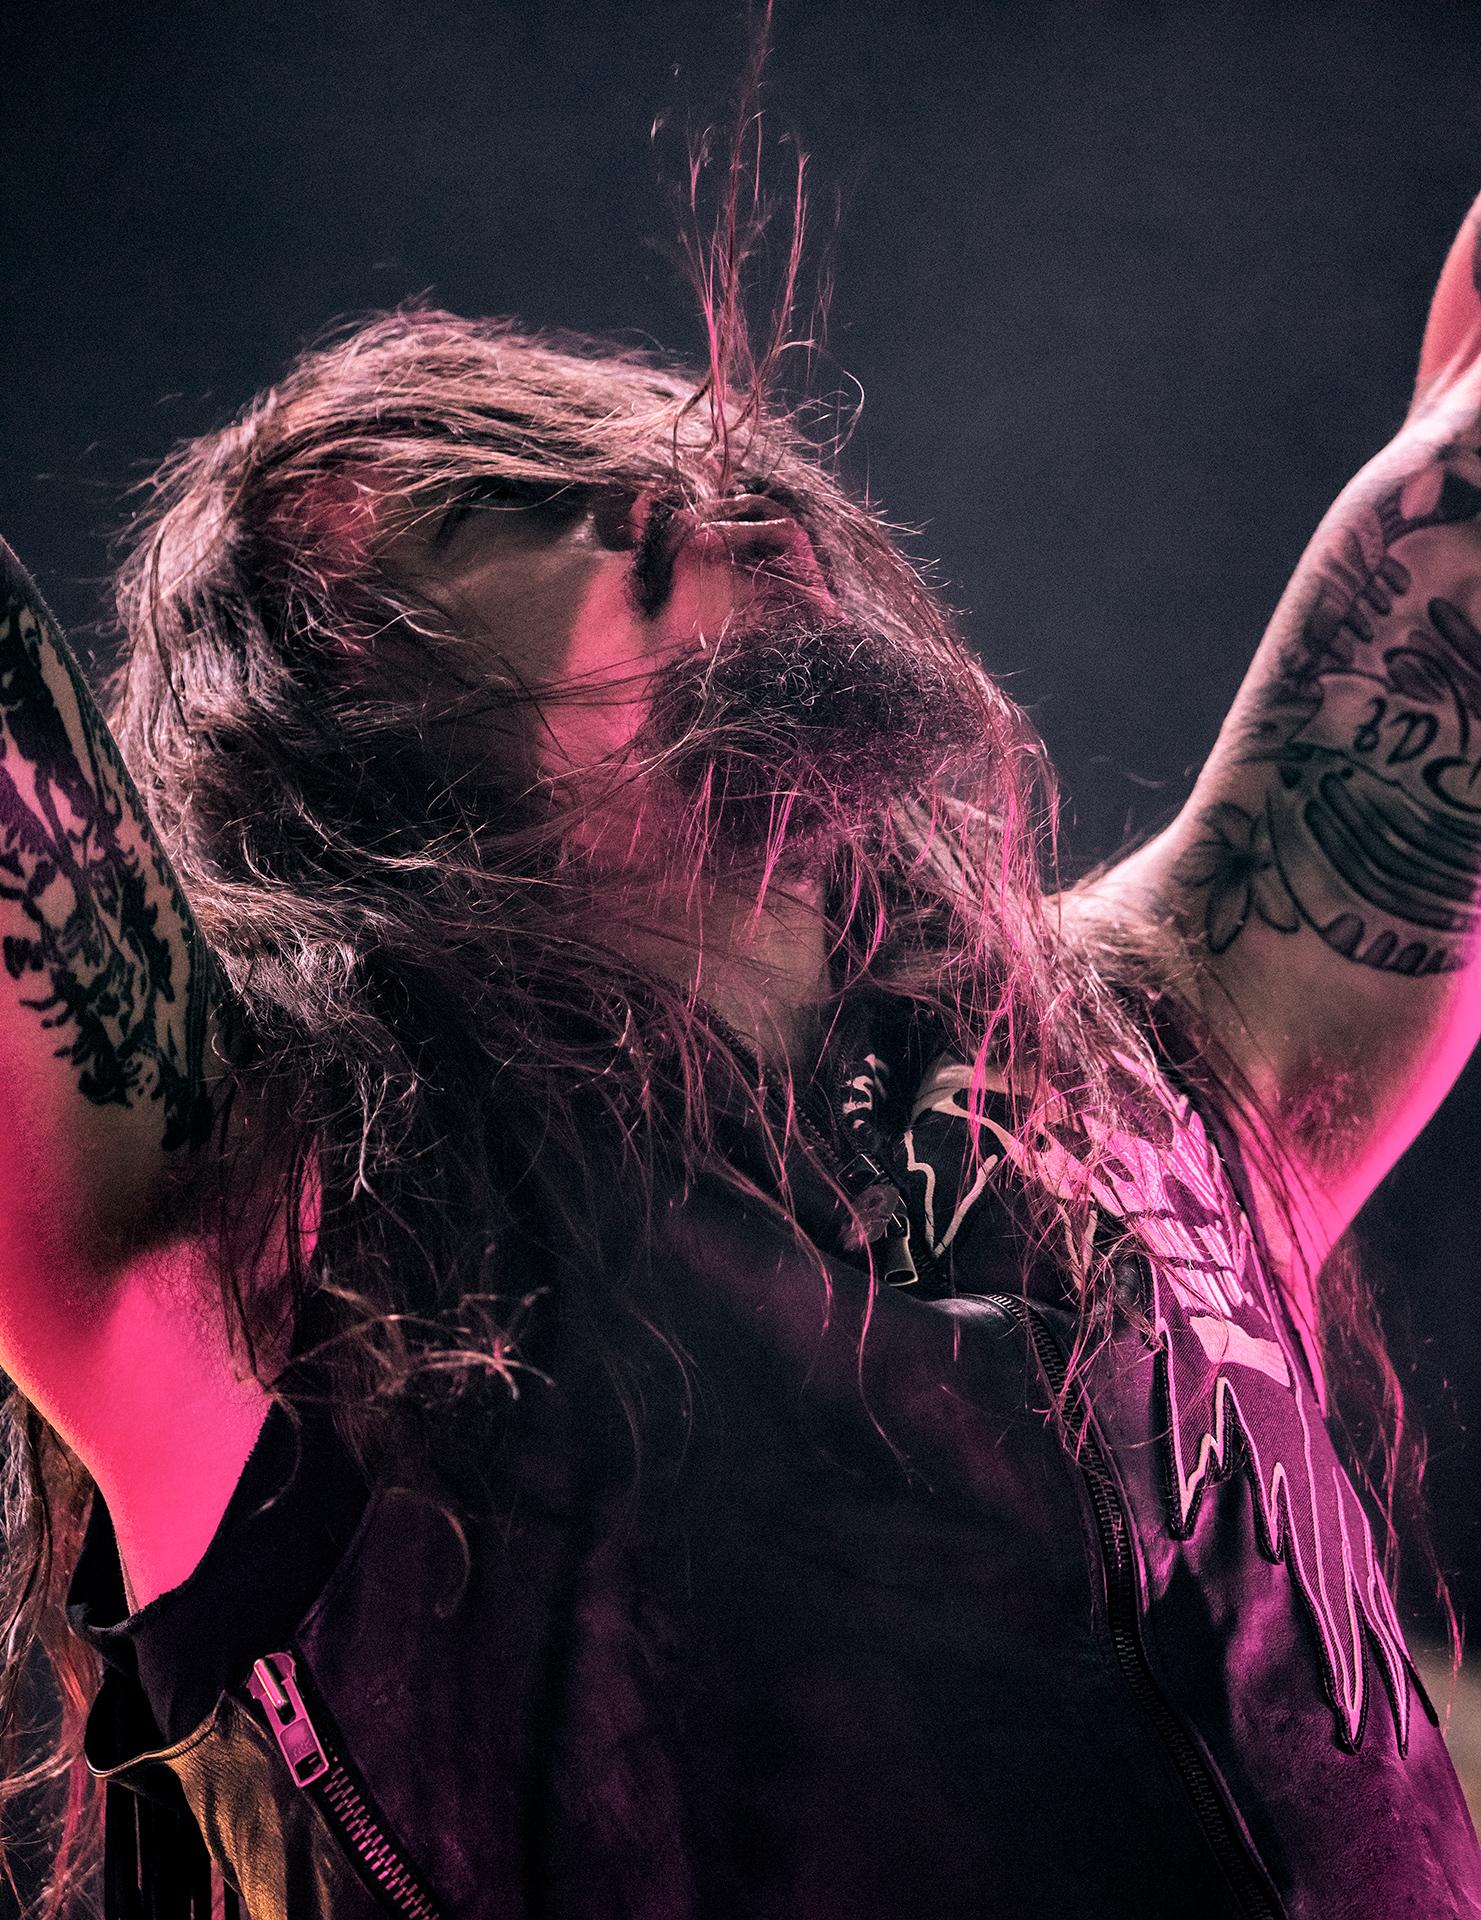 Tomi Joutsen, Amorphis, band vocalist, Tuska metal festival